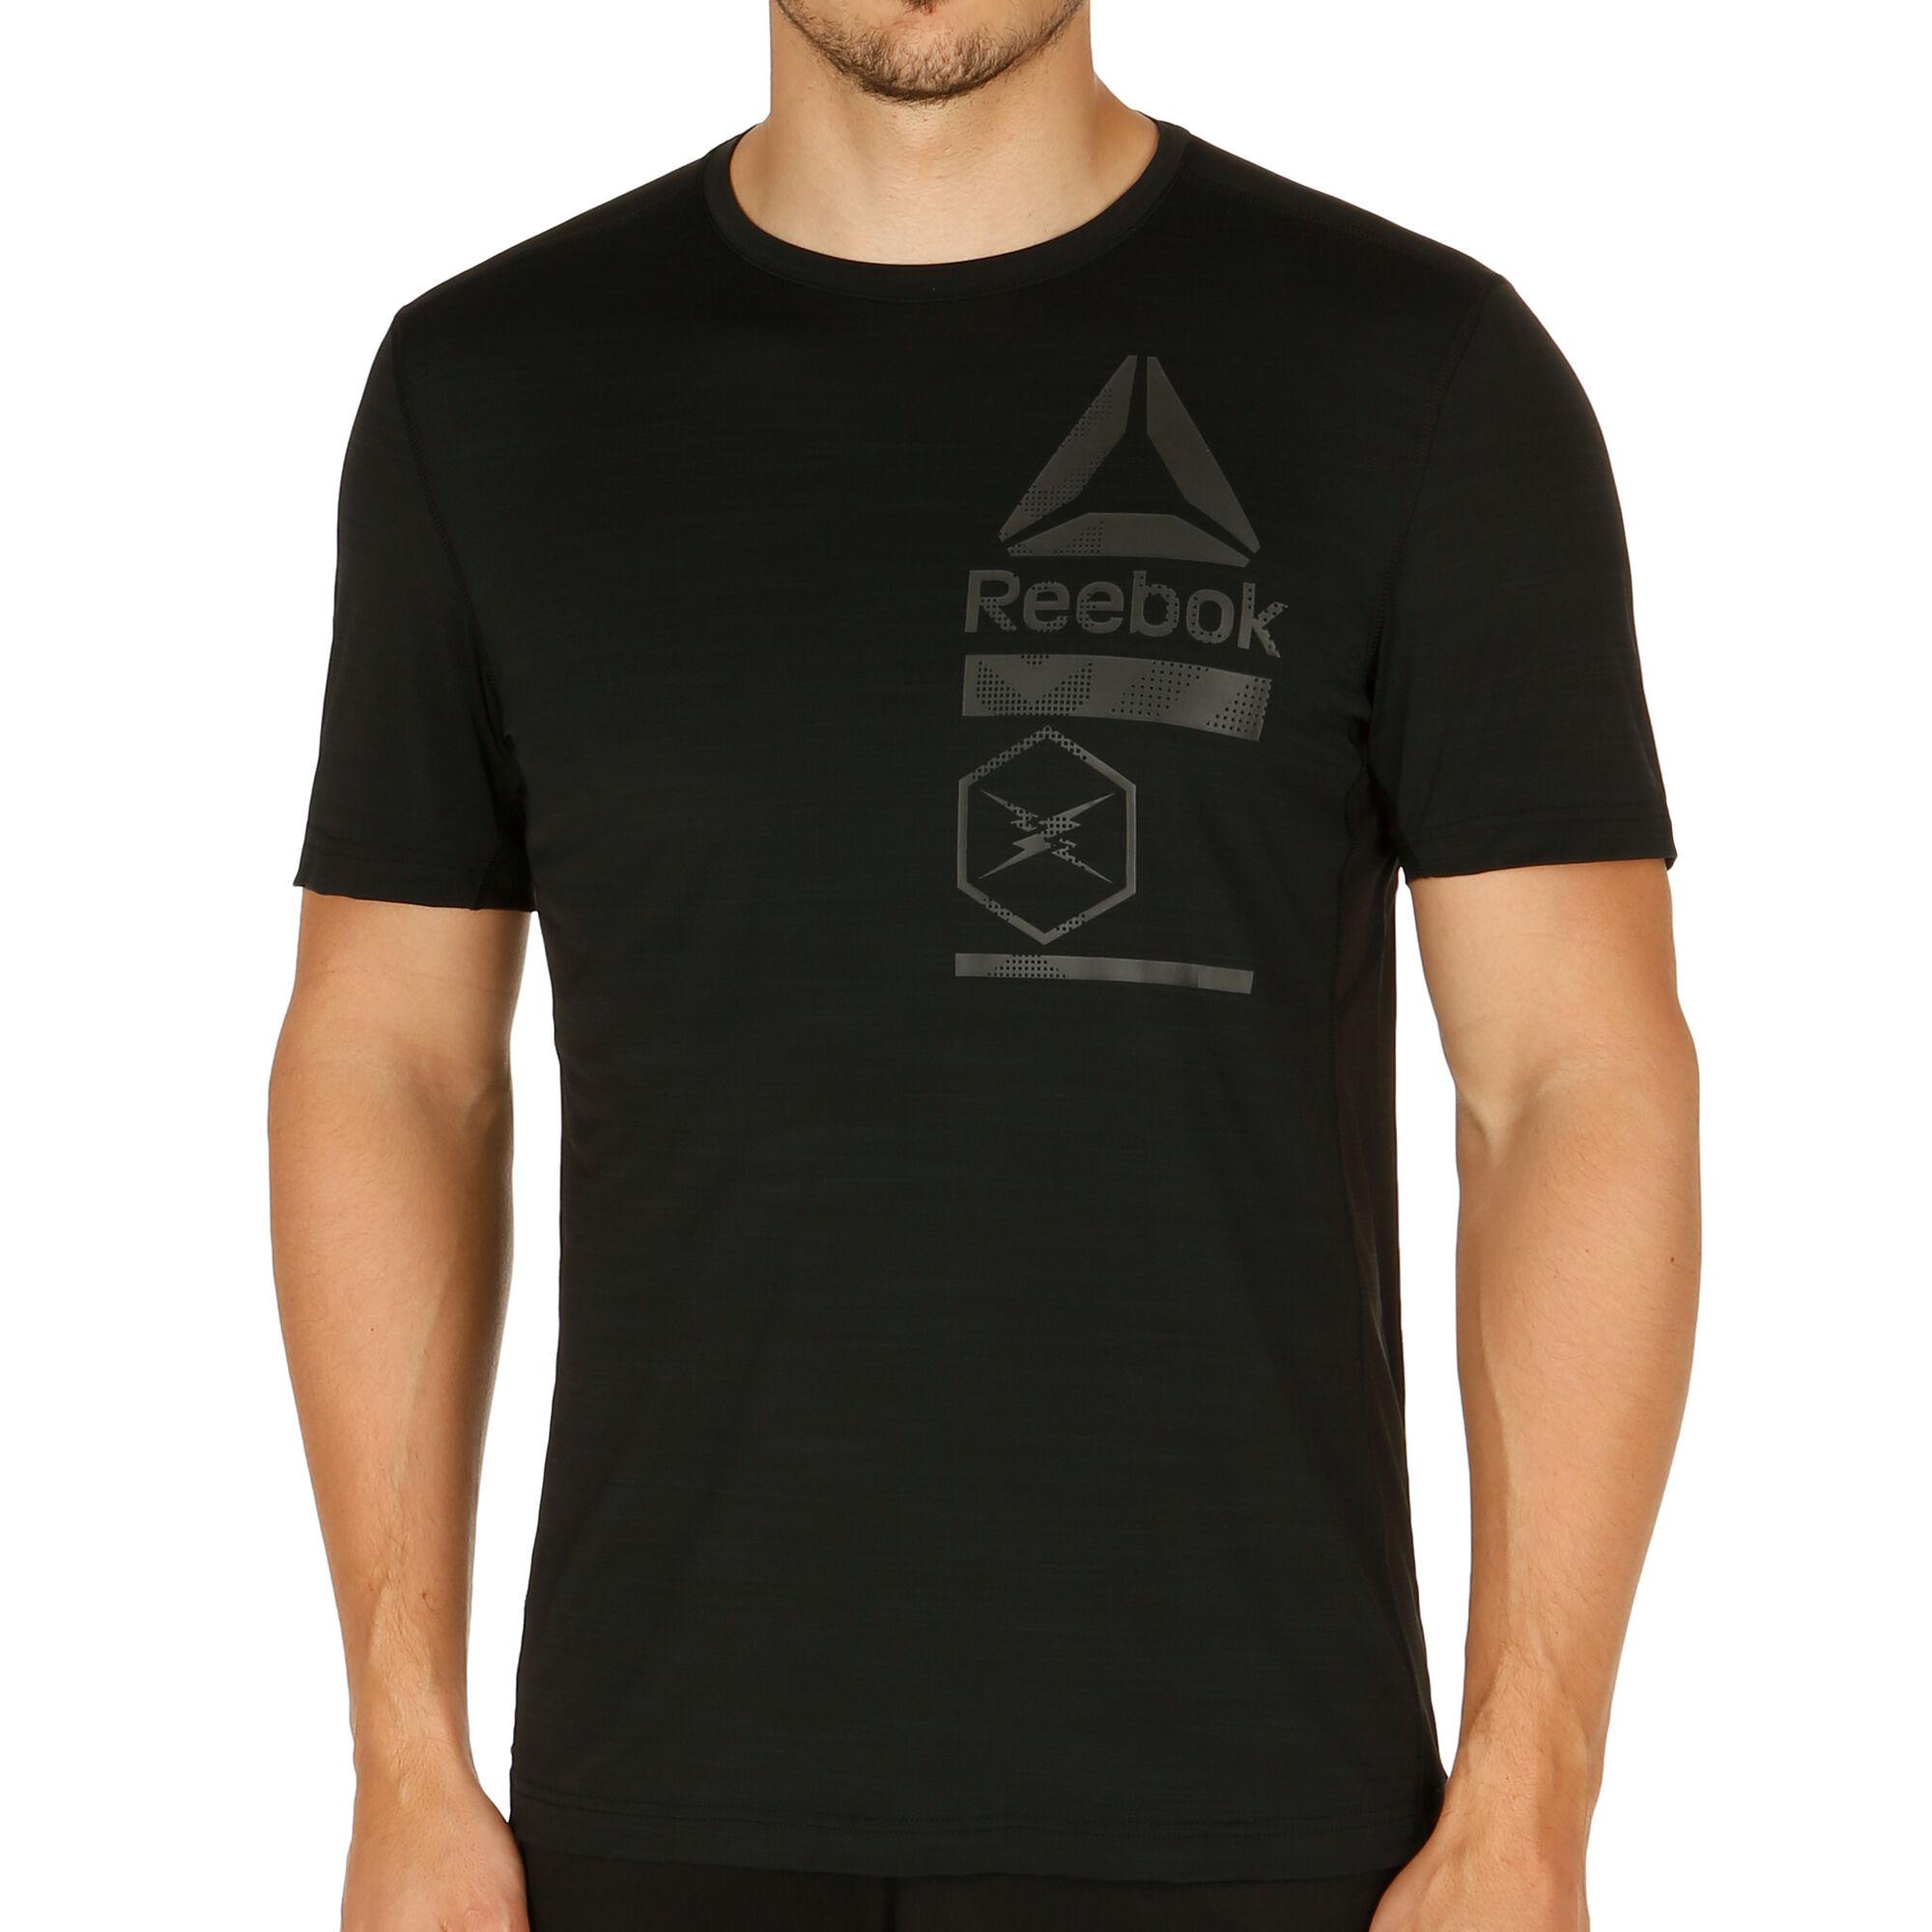 8802593f Reebok; Reebok; Reebok; Reebok; Reebok; Reebok; Reebok. ActivChill Zoned  Graphic Men ...